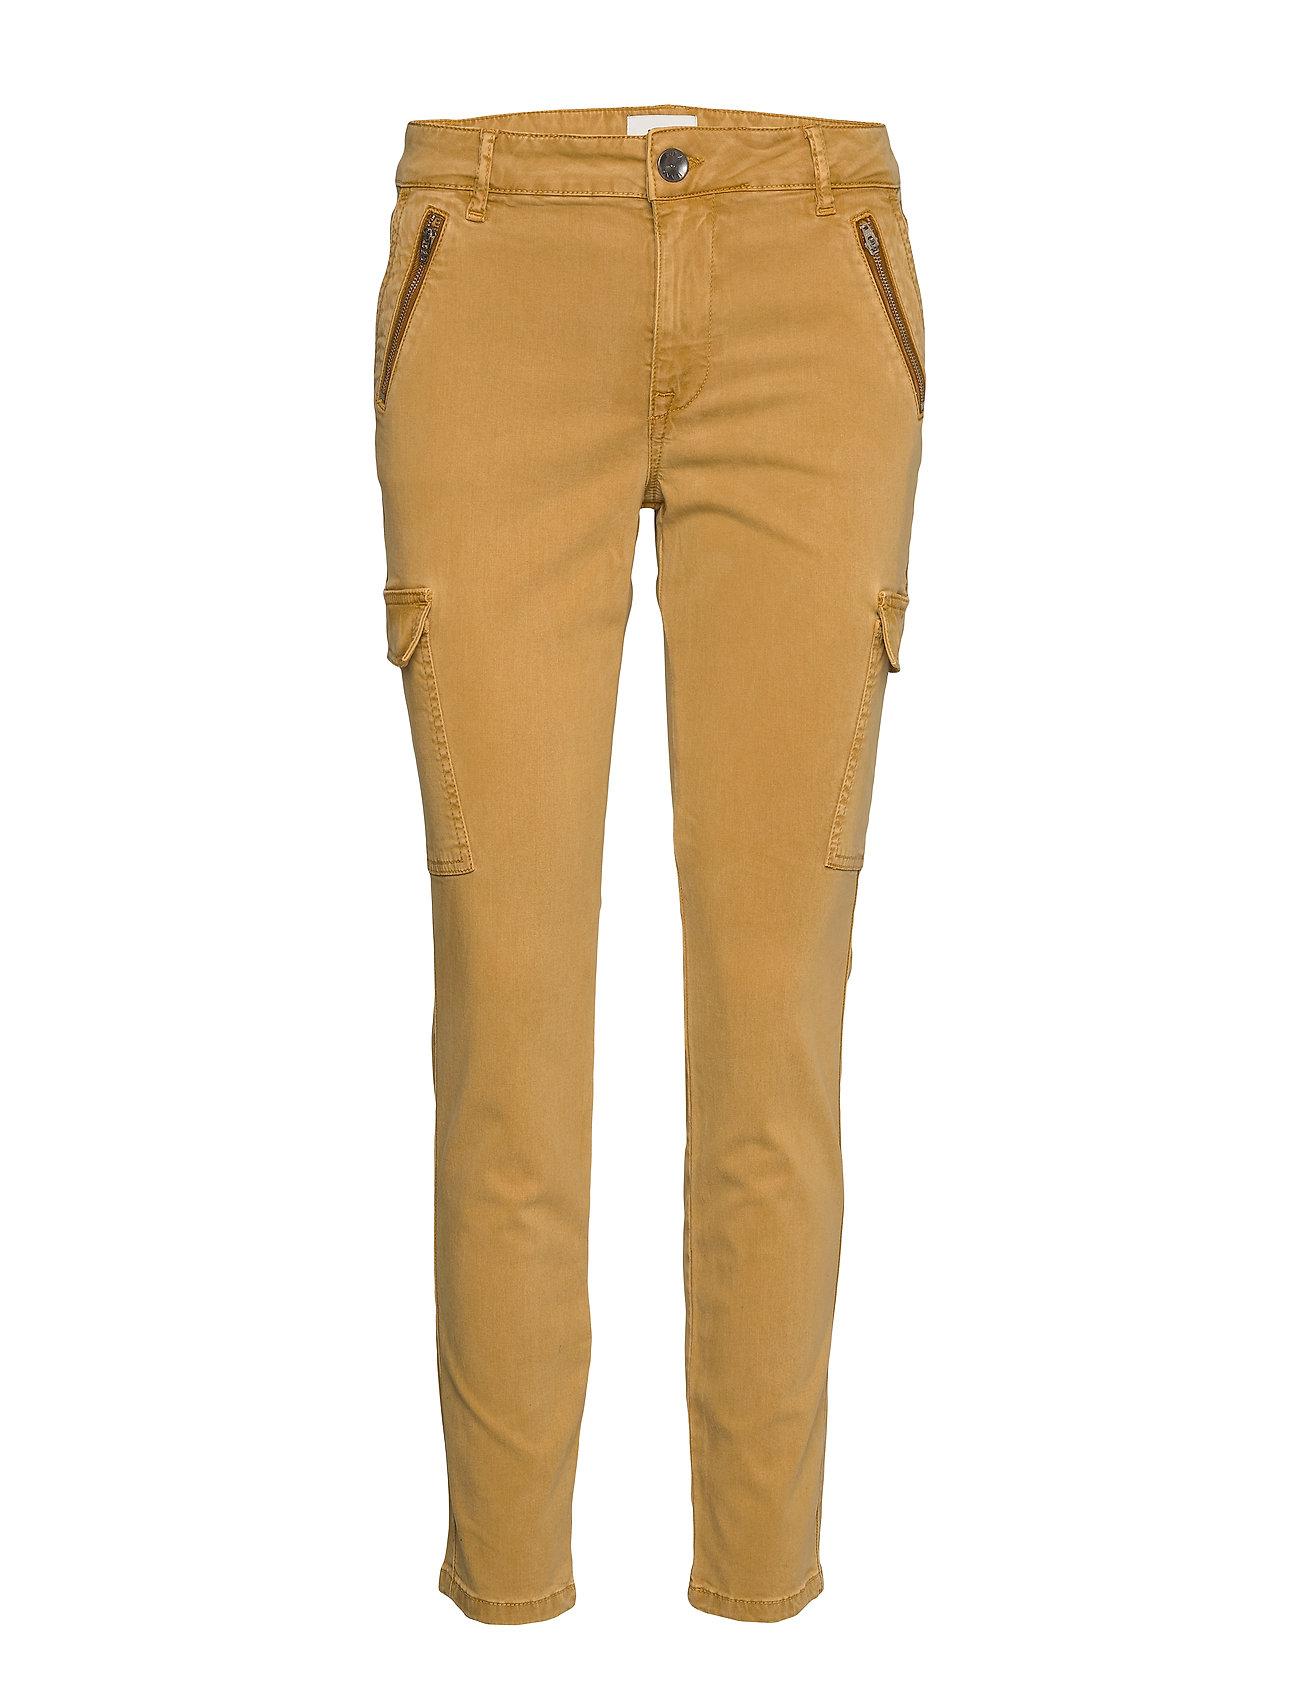 Image of Pxelva Pant Bukser Med Lige Ben Gul Pulz Jeans (3307693441)